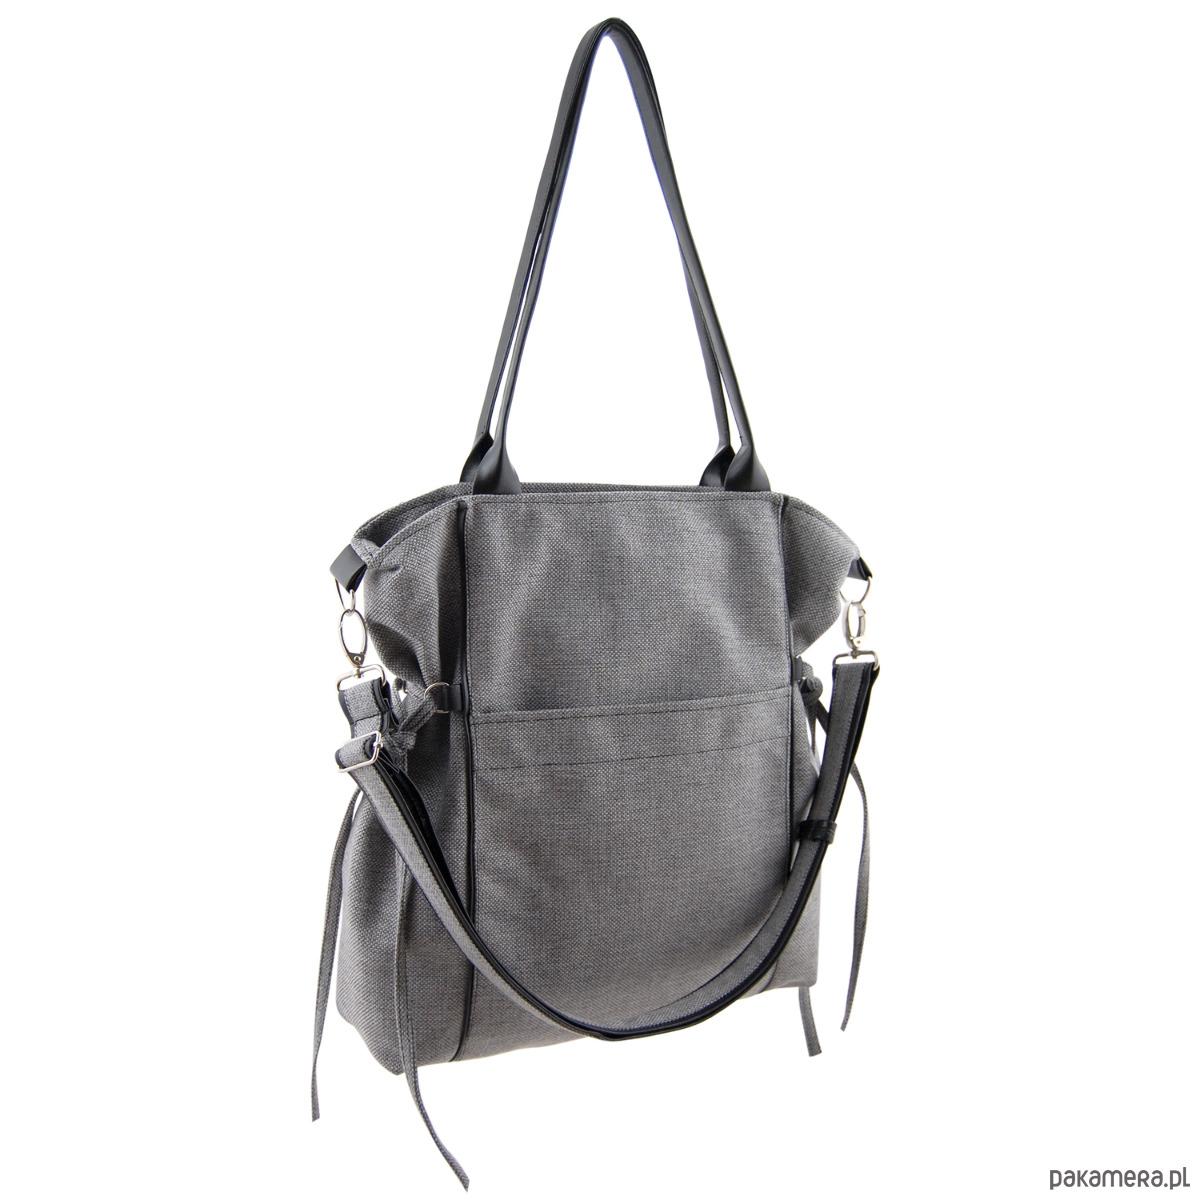 e485d1c758581 AMBER - duża torba - shopper - szara plecionka - torby na ramię ...